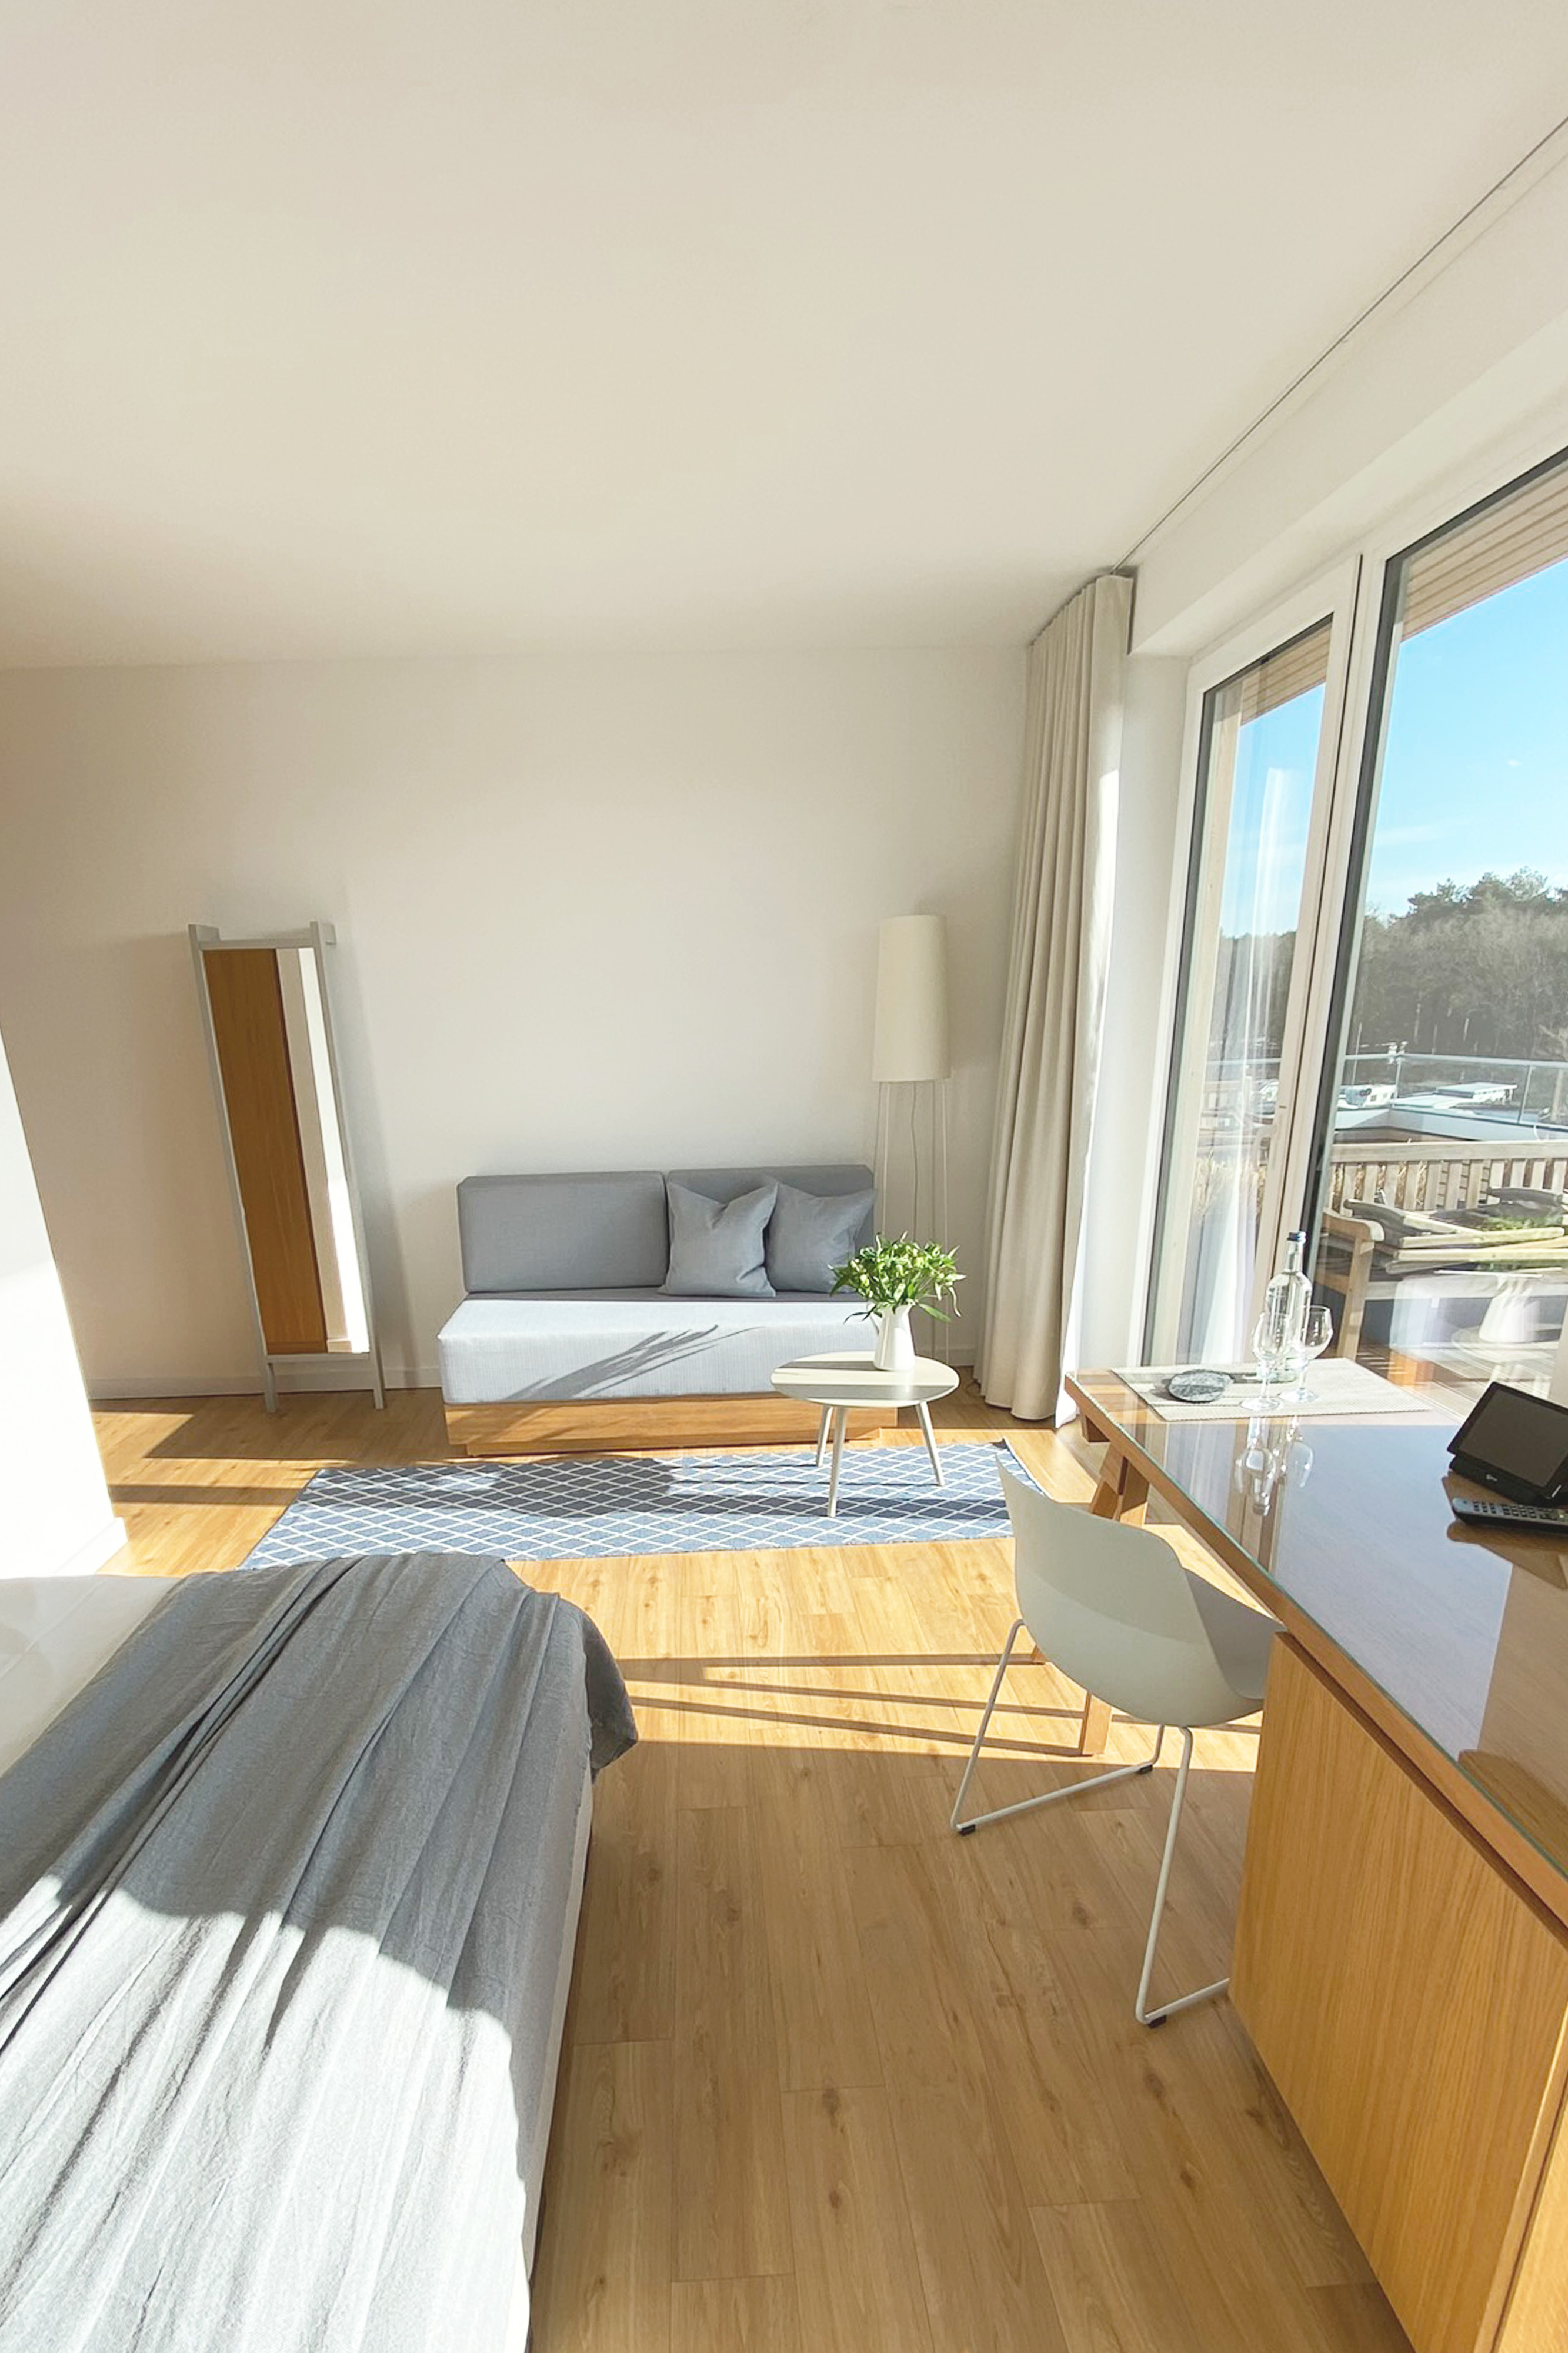 Strandhus Hotel Cuxhaven Premium Seeseite